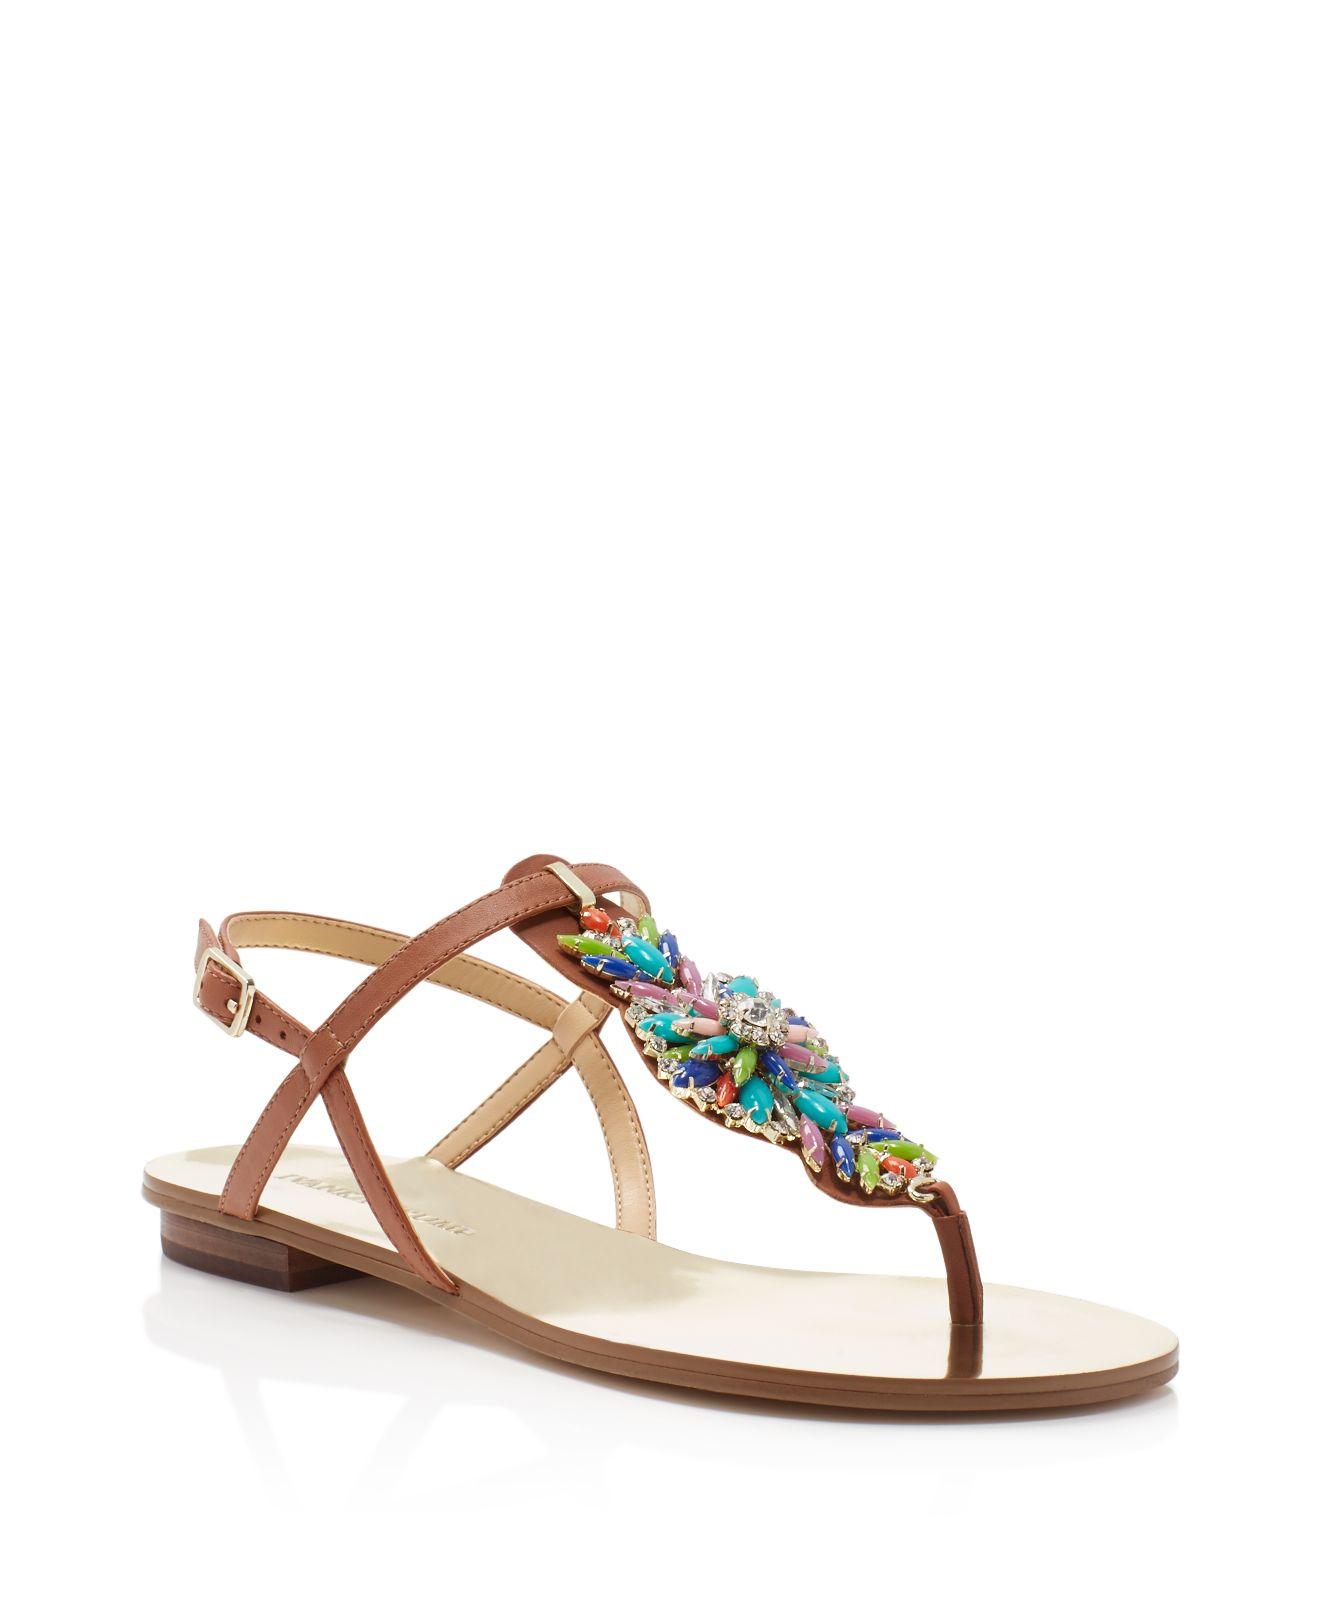 a3cf4df60 Ivanka Trump Fyona Embellished T Strap Sandals - Lyst